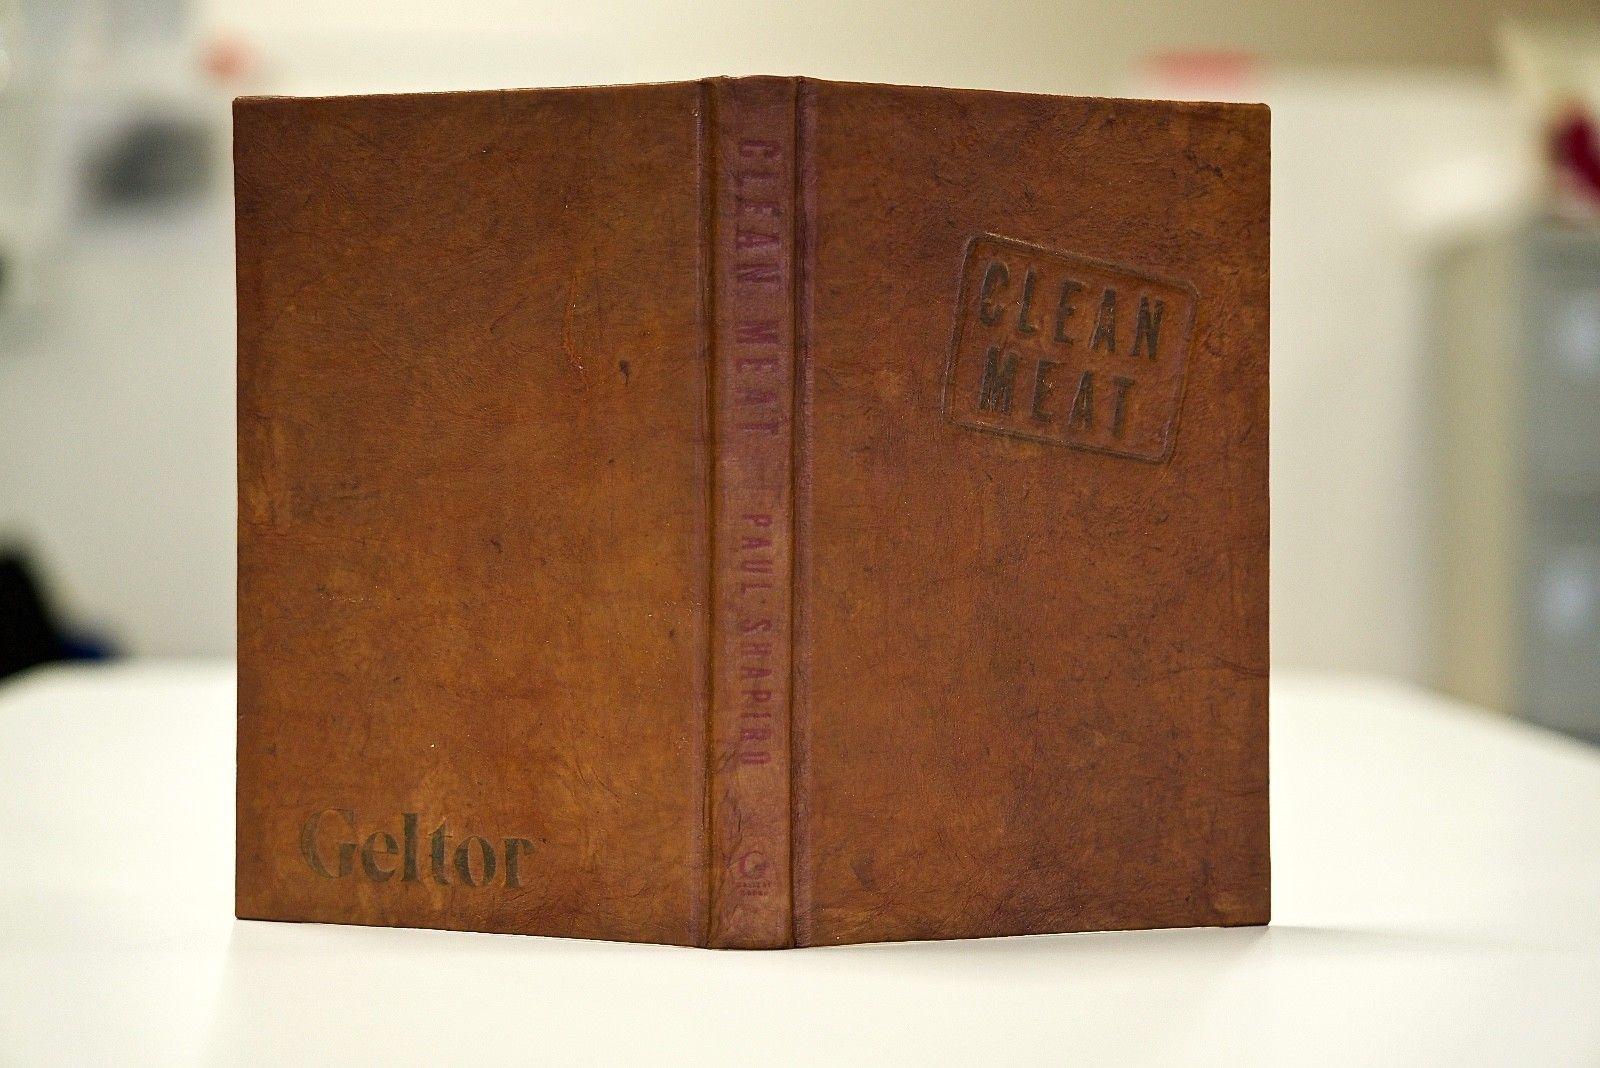 LeatherBook